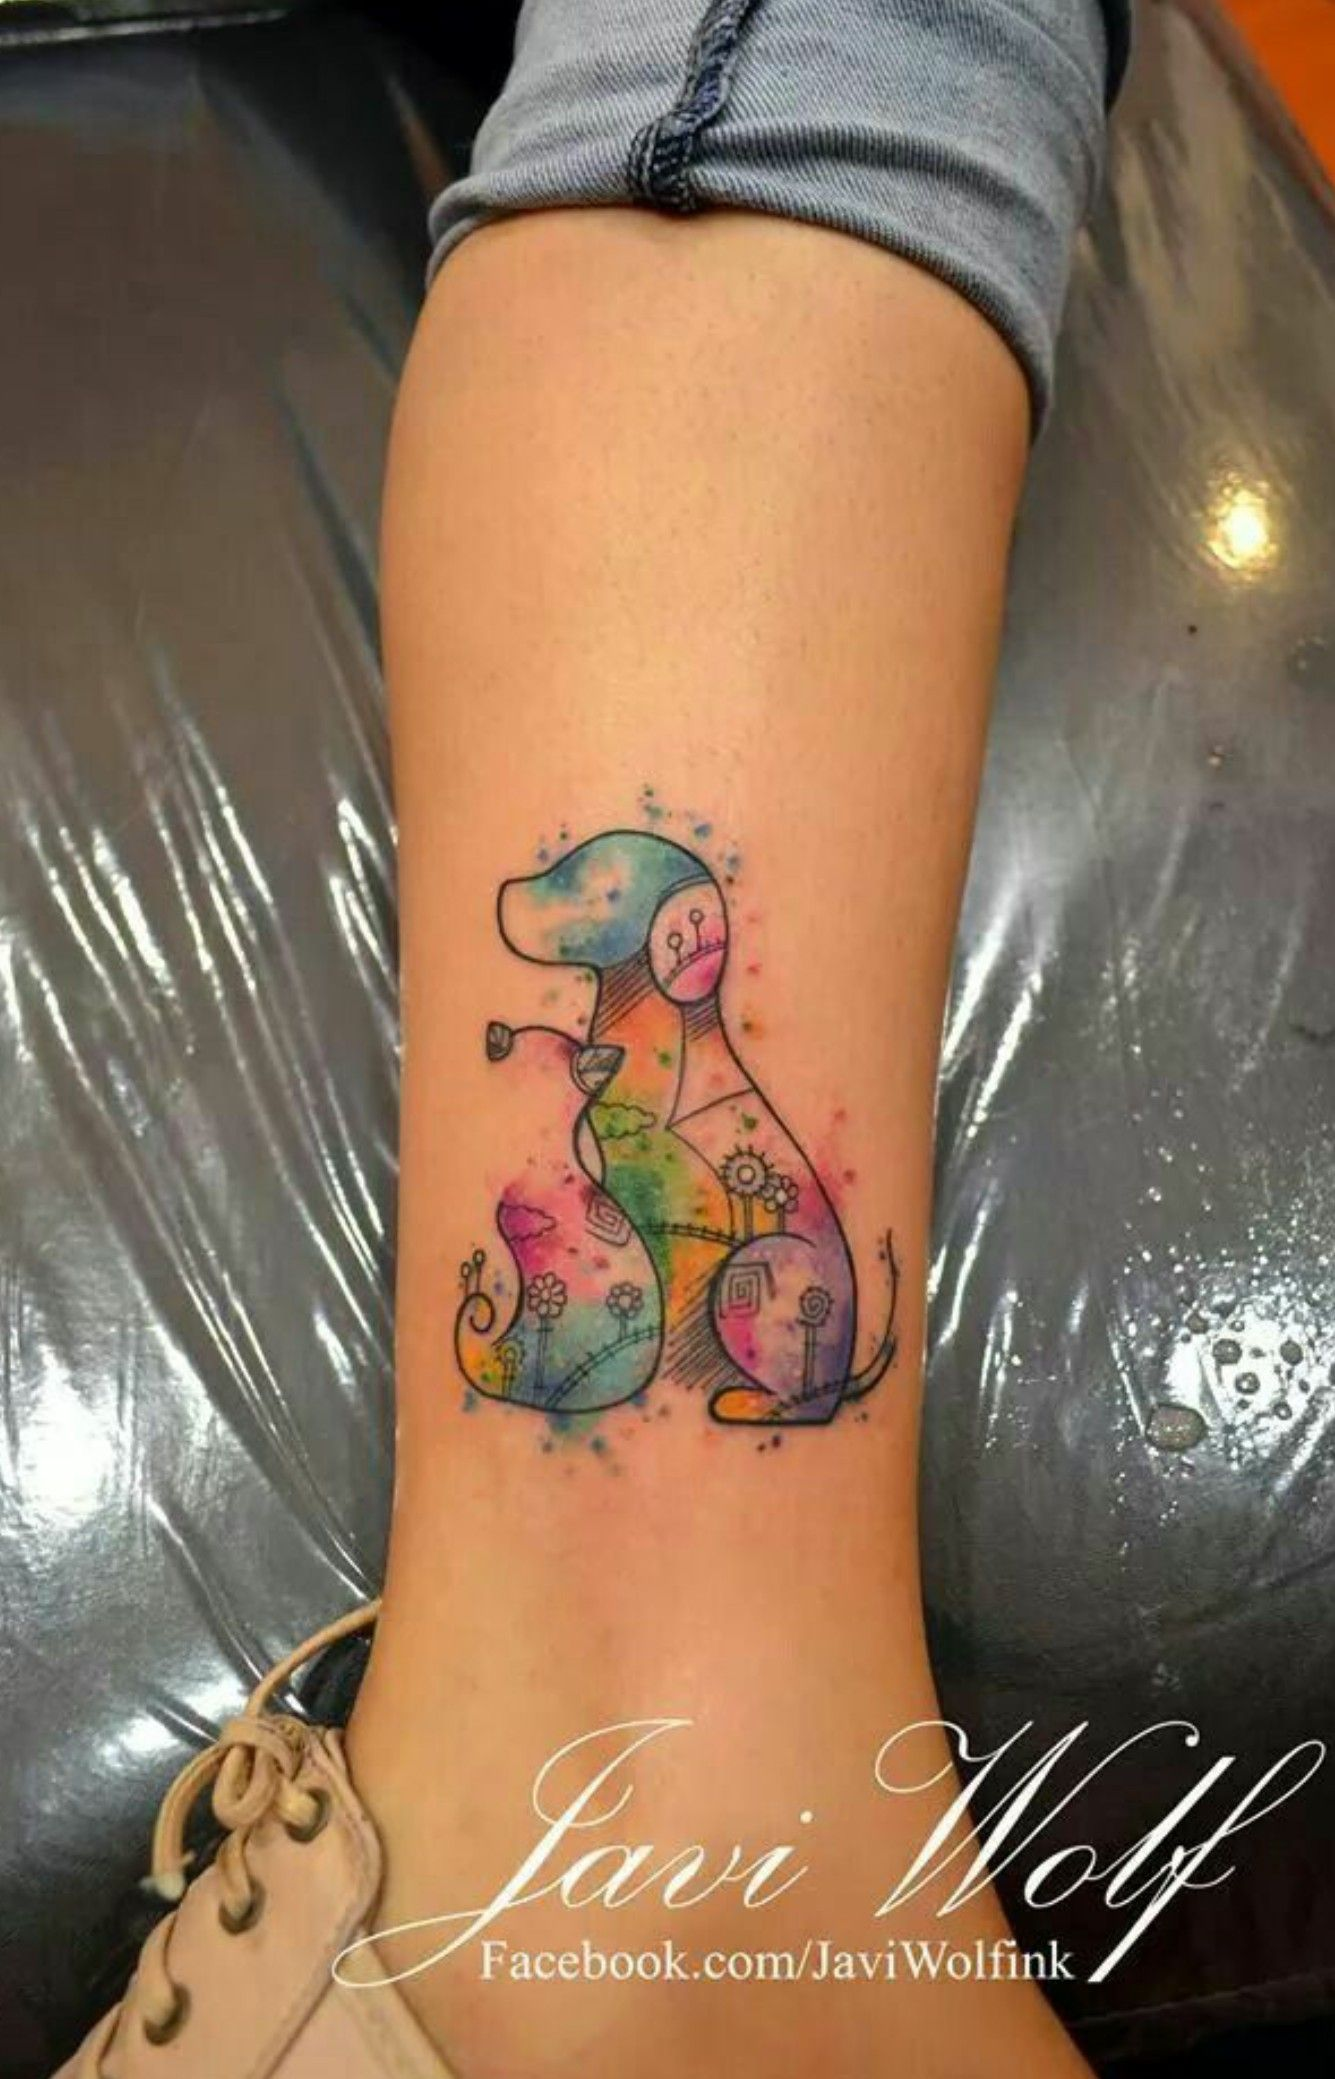 Pin By Sally Robbins On Tattoos Tattoos Dog Tattoos Silhouette